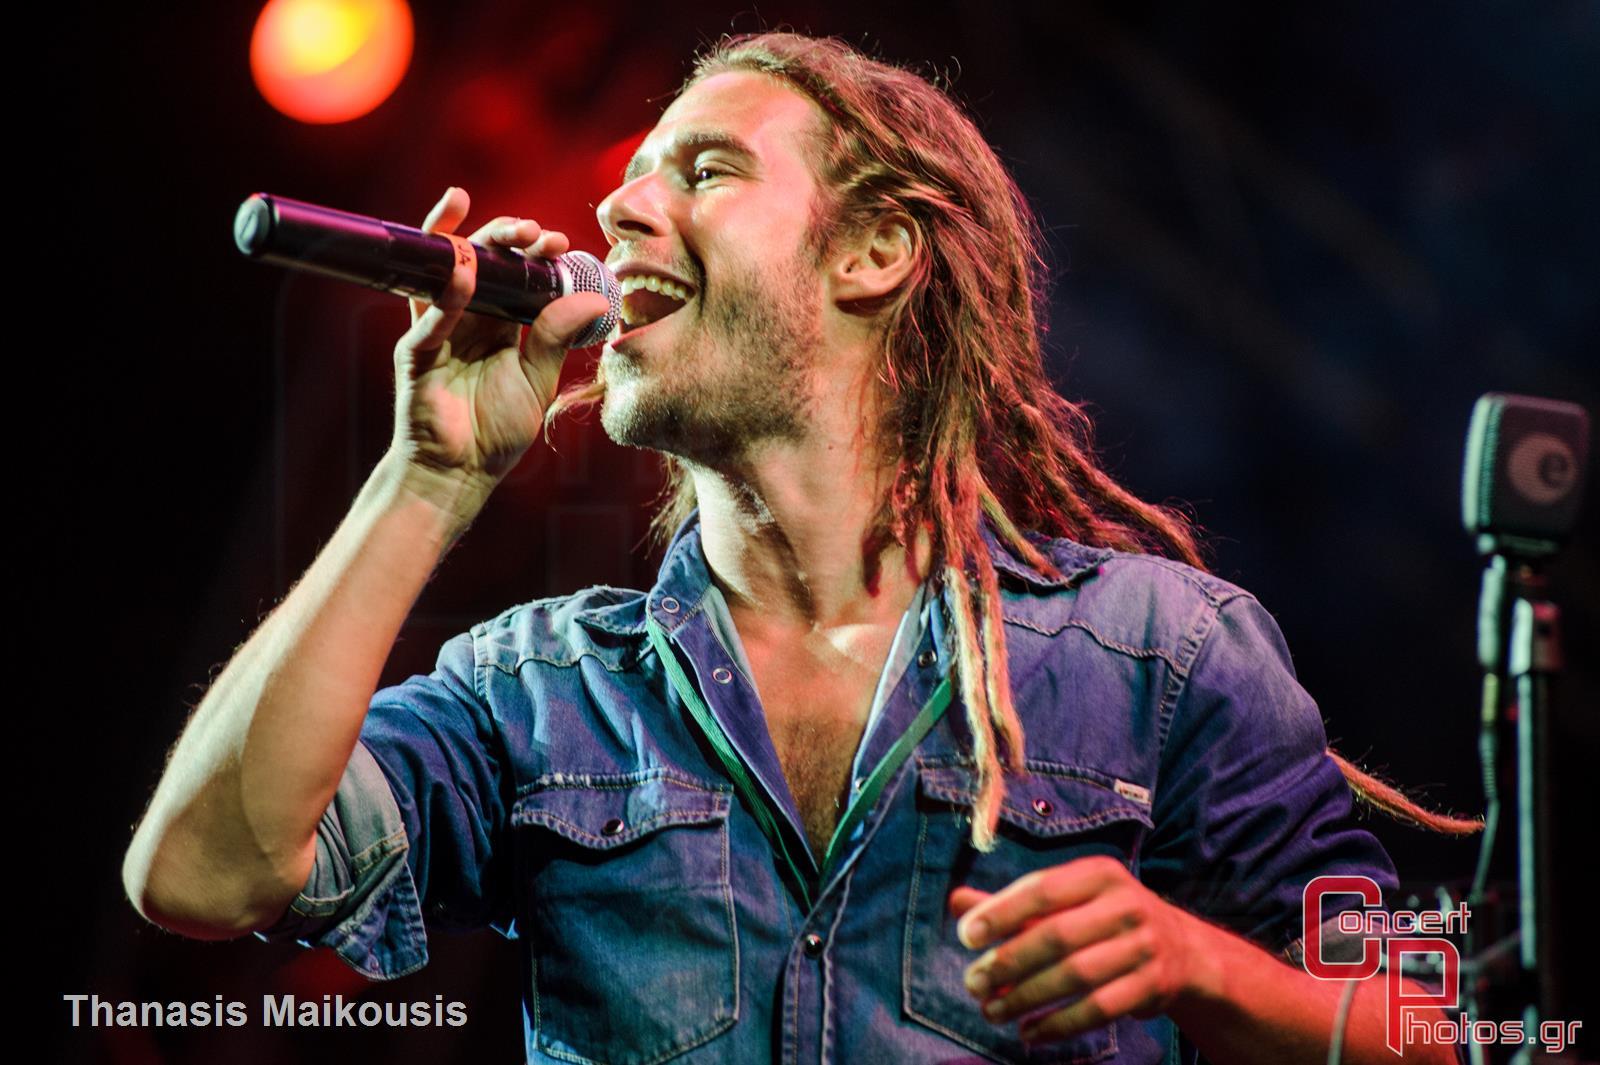 Active Member - Τραγούδα μας να φύγει το σκοτάδι- photographer: Thanasis Maikousis - concertphotos_-5136